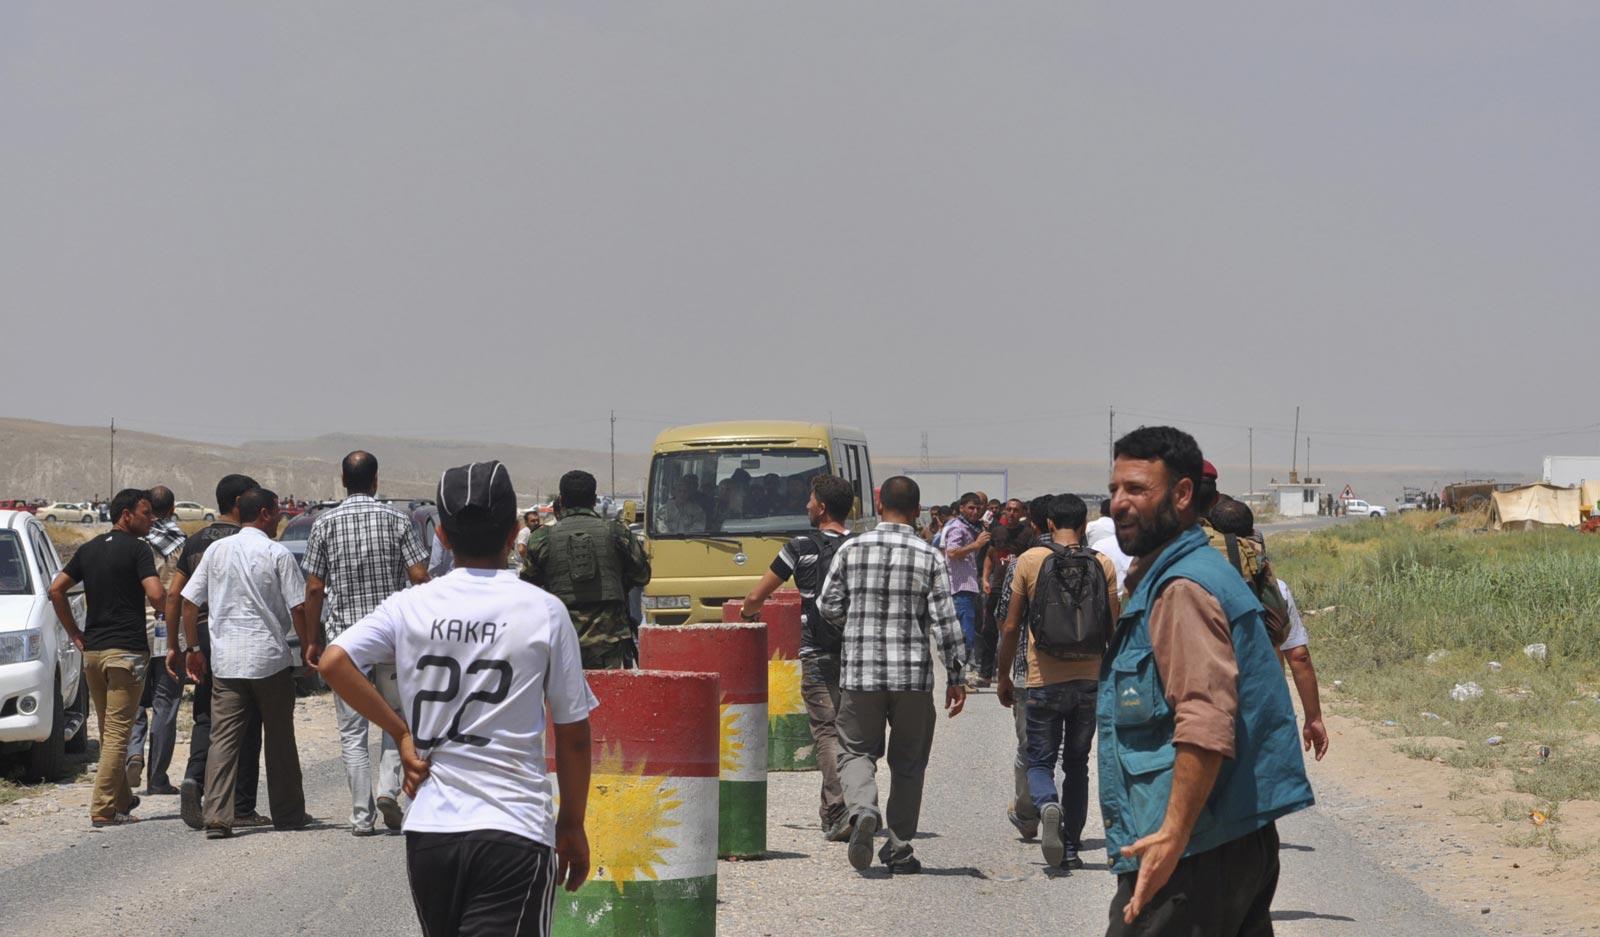 isplaced-families-minority-yazidi-sect-fleeing-violence-walk-outskirts-sinjar-west-mosul